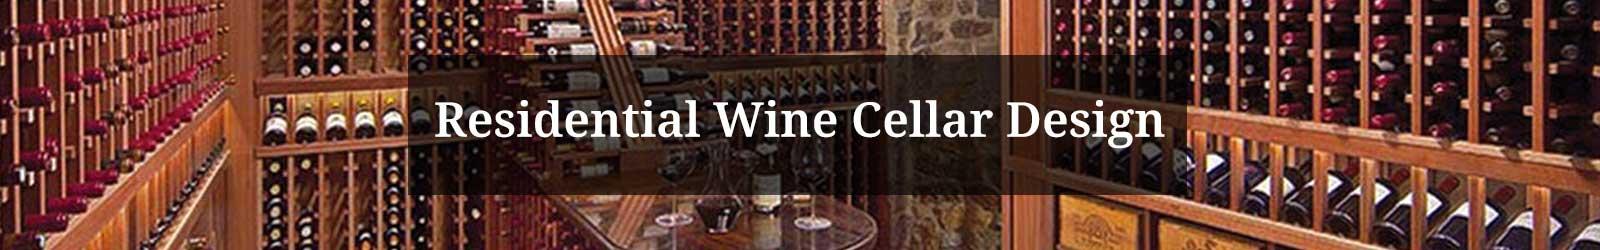 Residential Wine Cellar Design